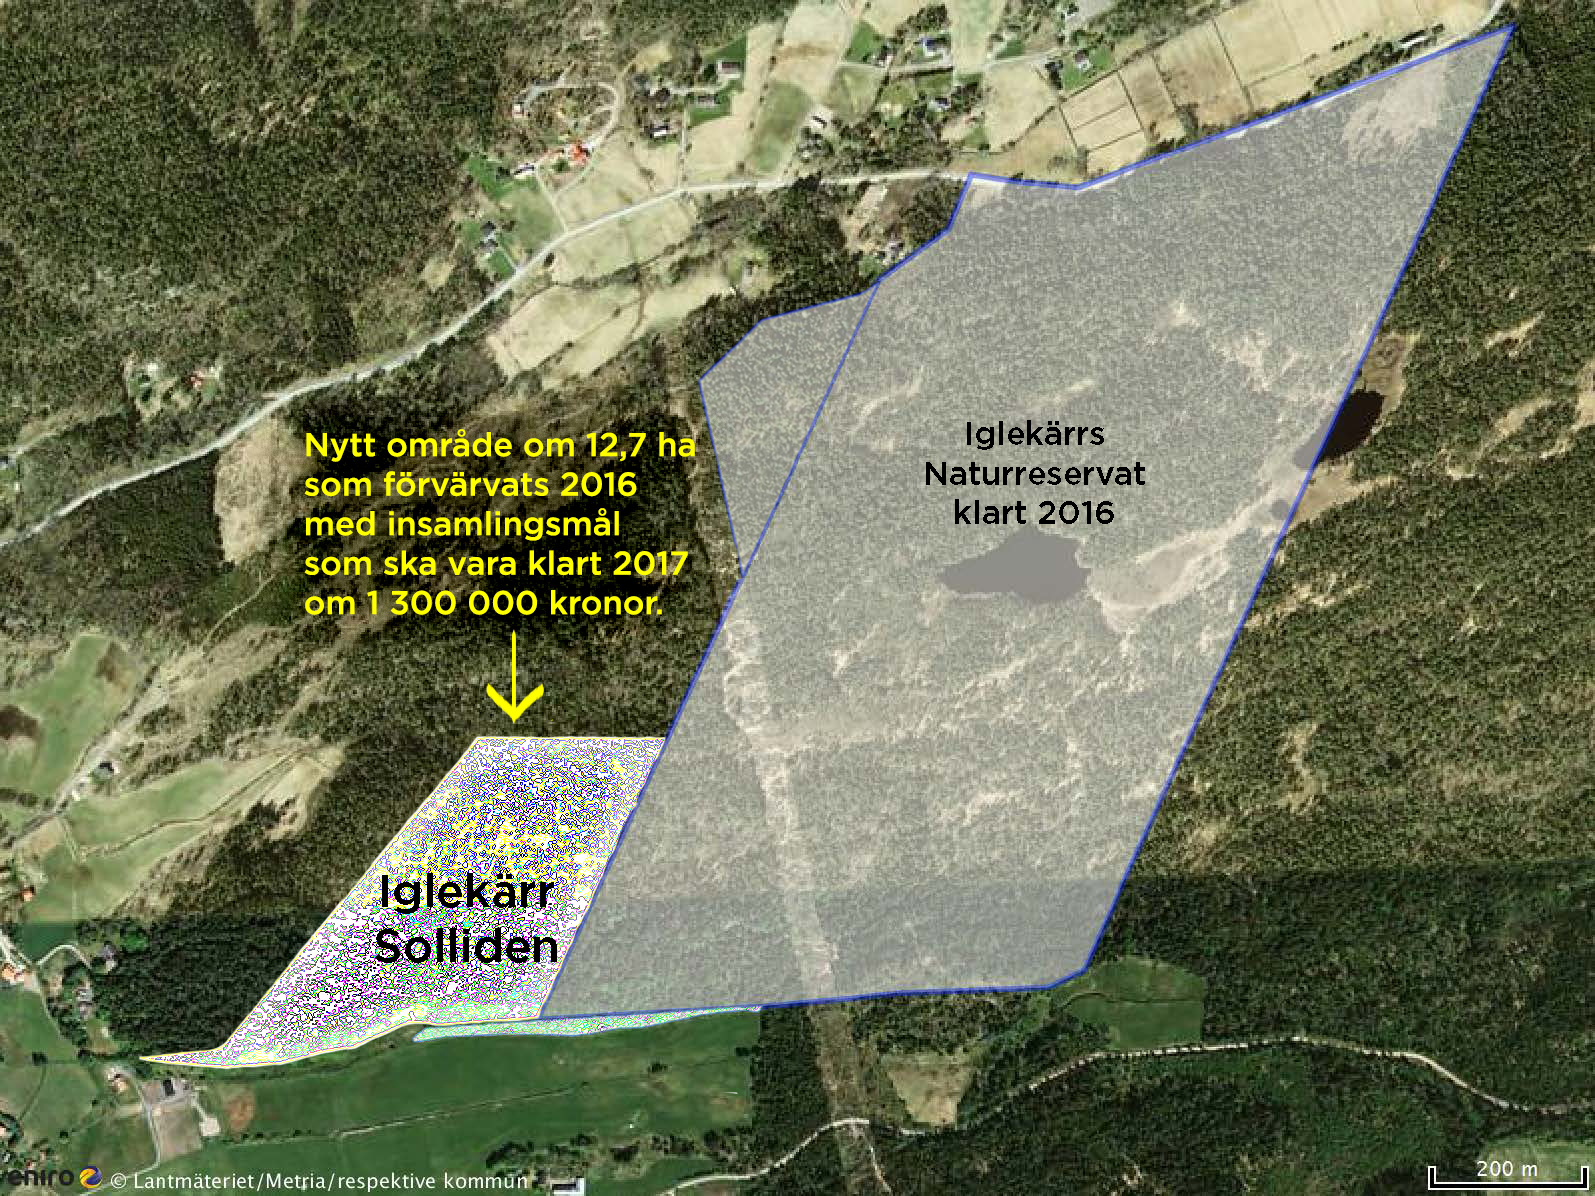 Solliden - Ny skog som bevaras 2017